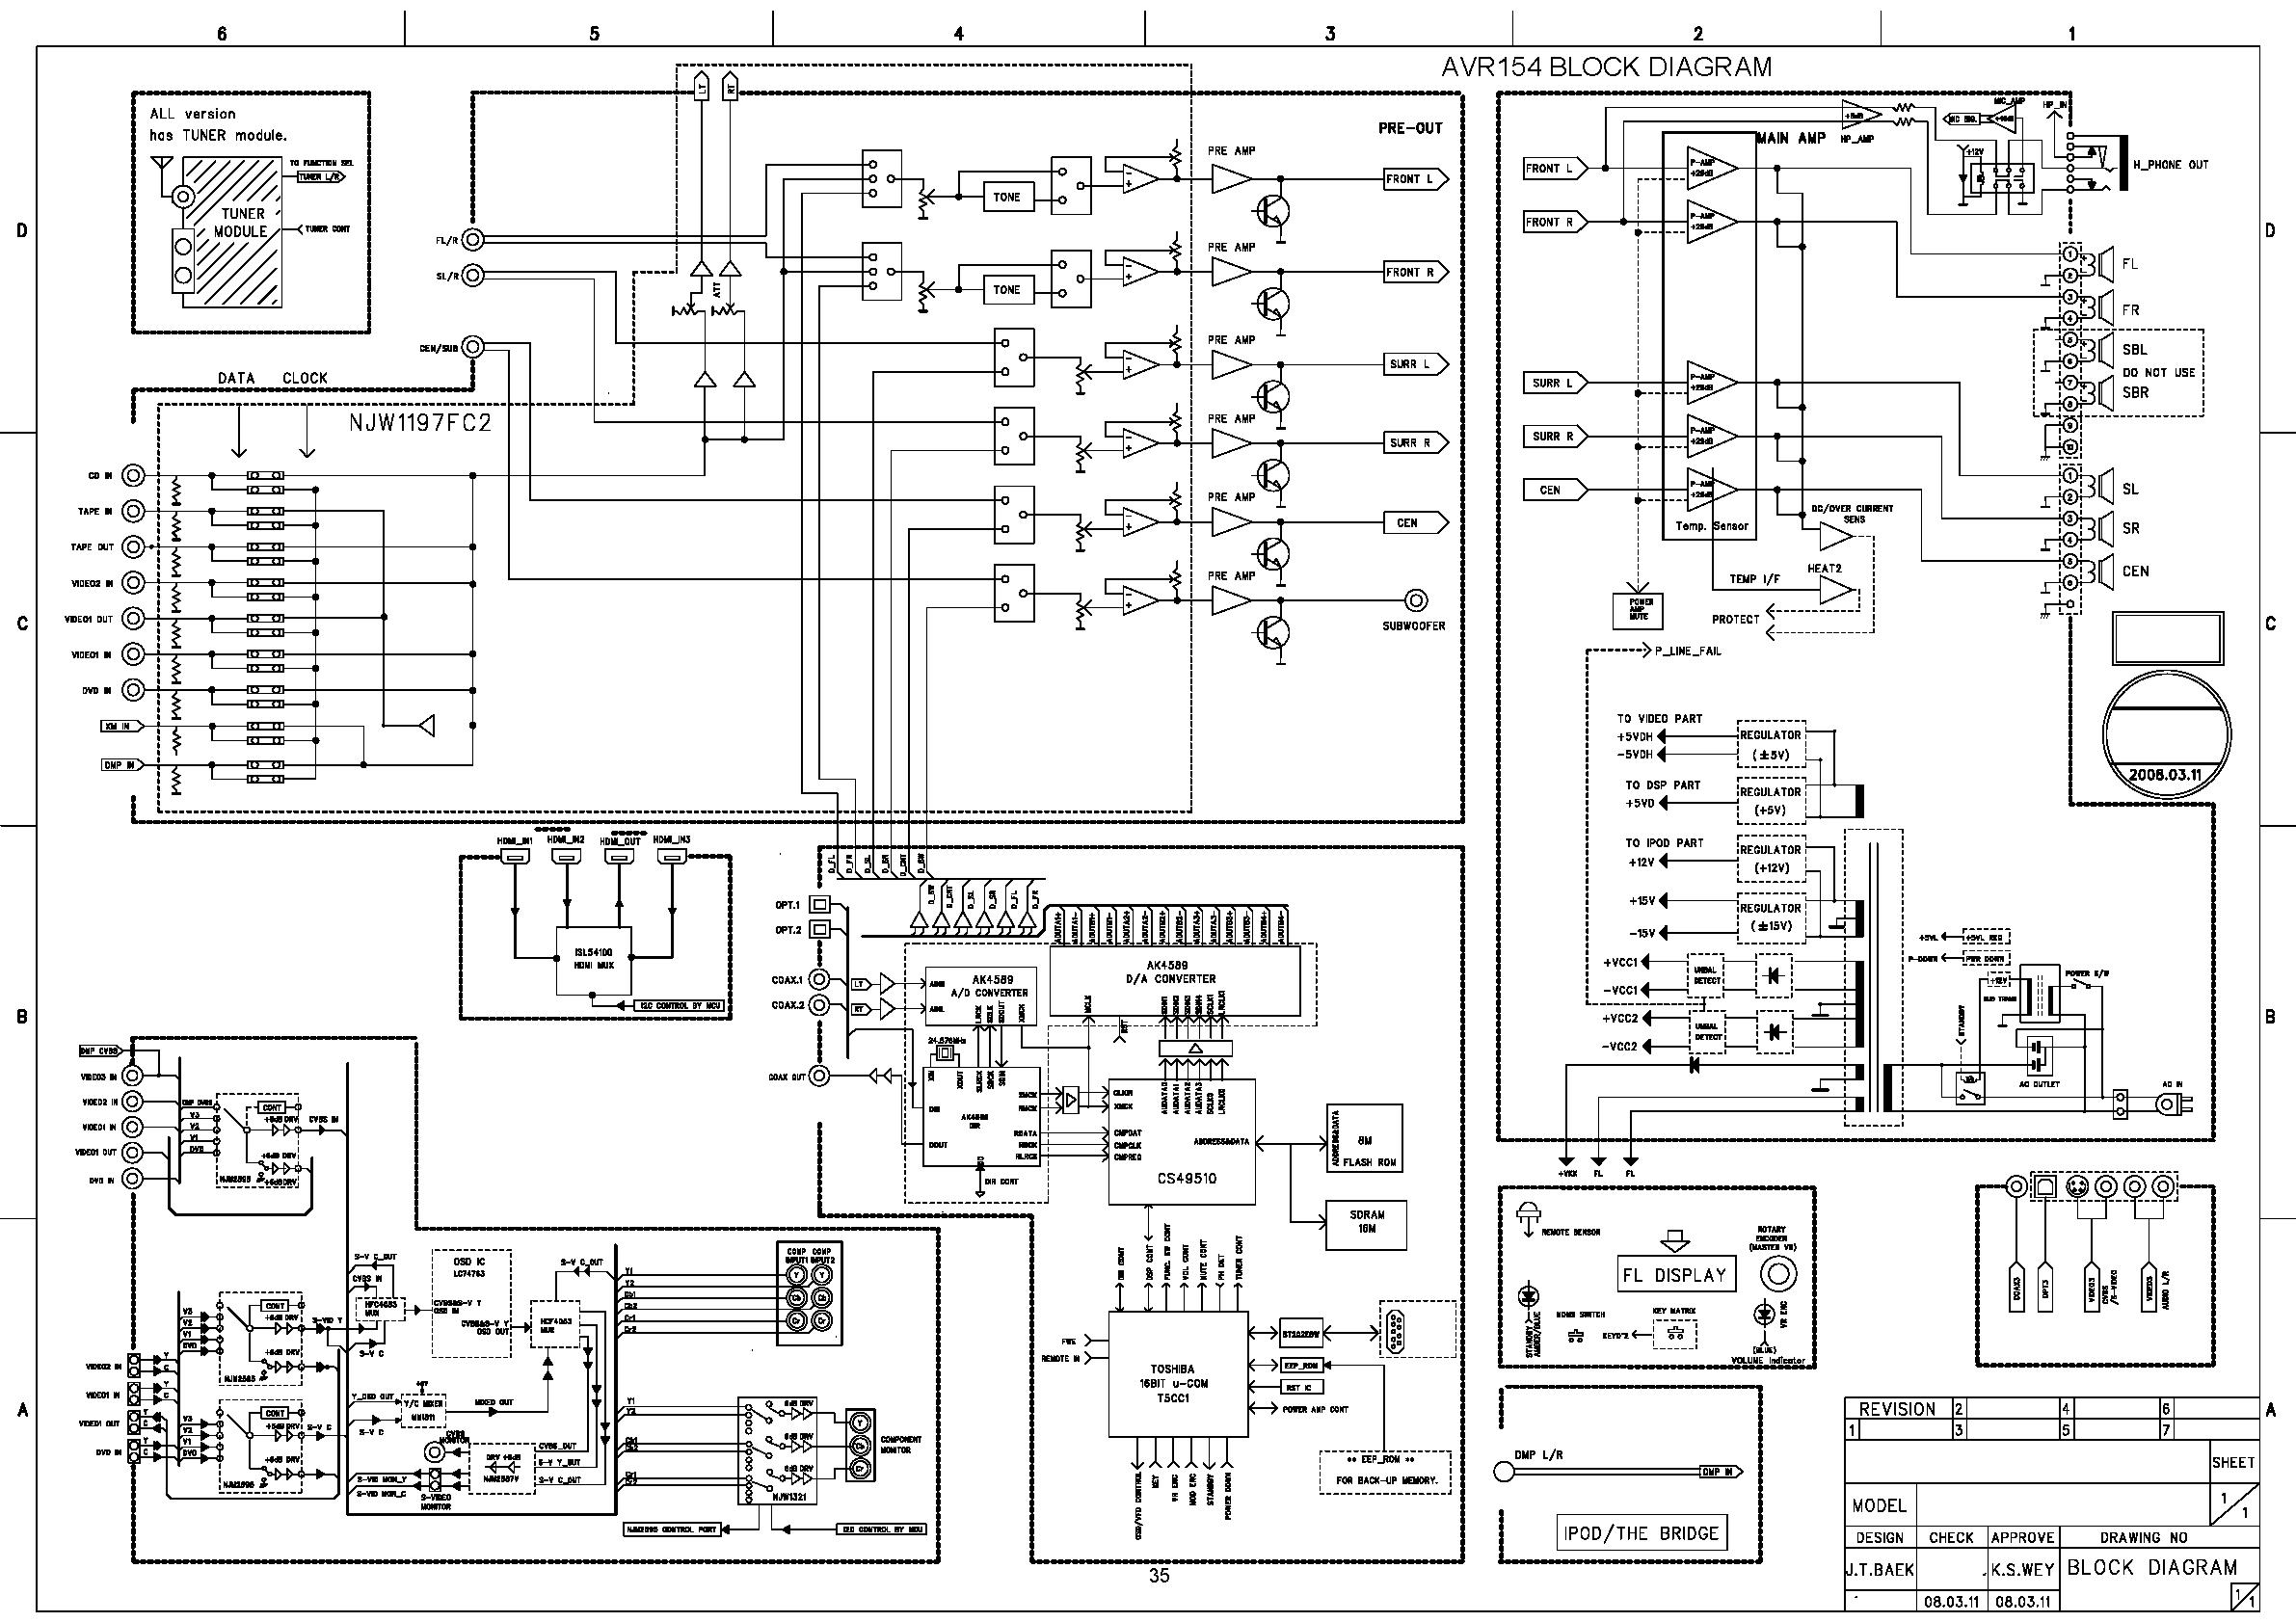 service manual  wire diagram for 1993 gmc 3500 4 wheel